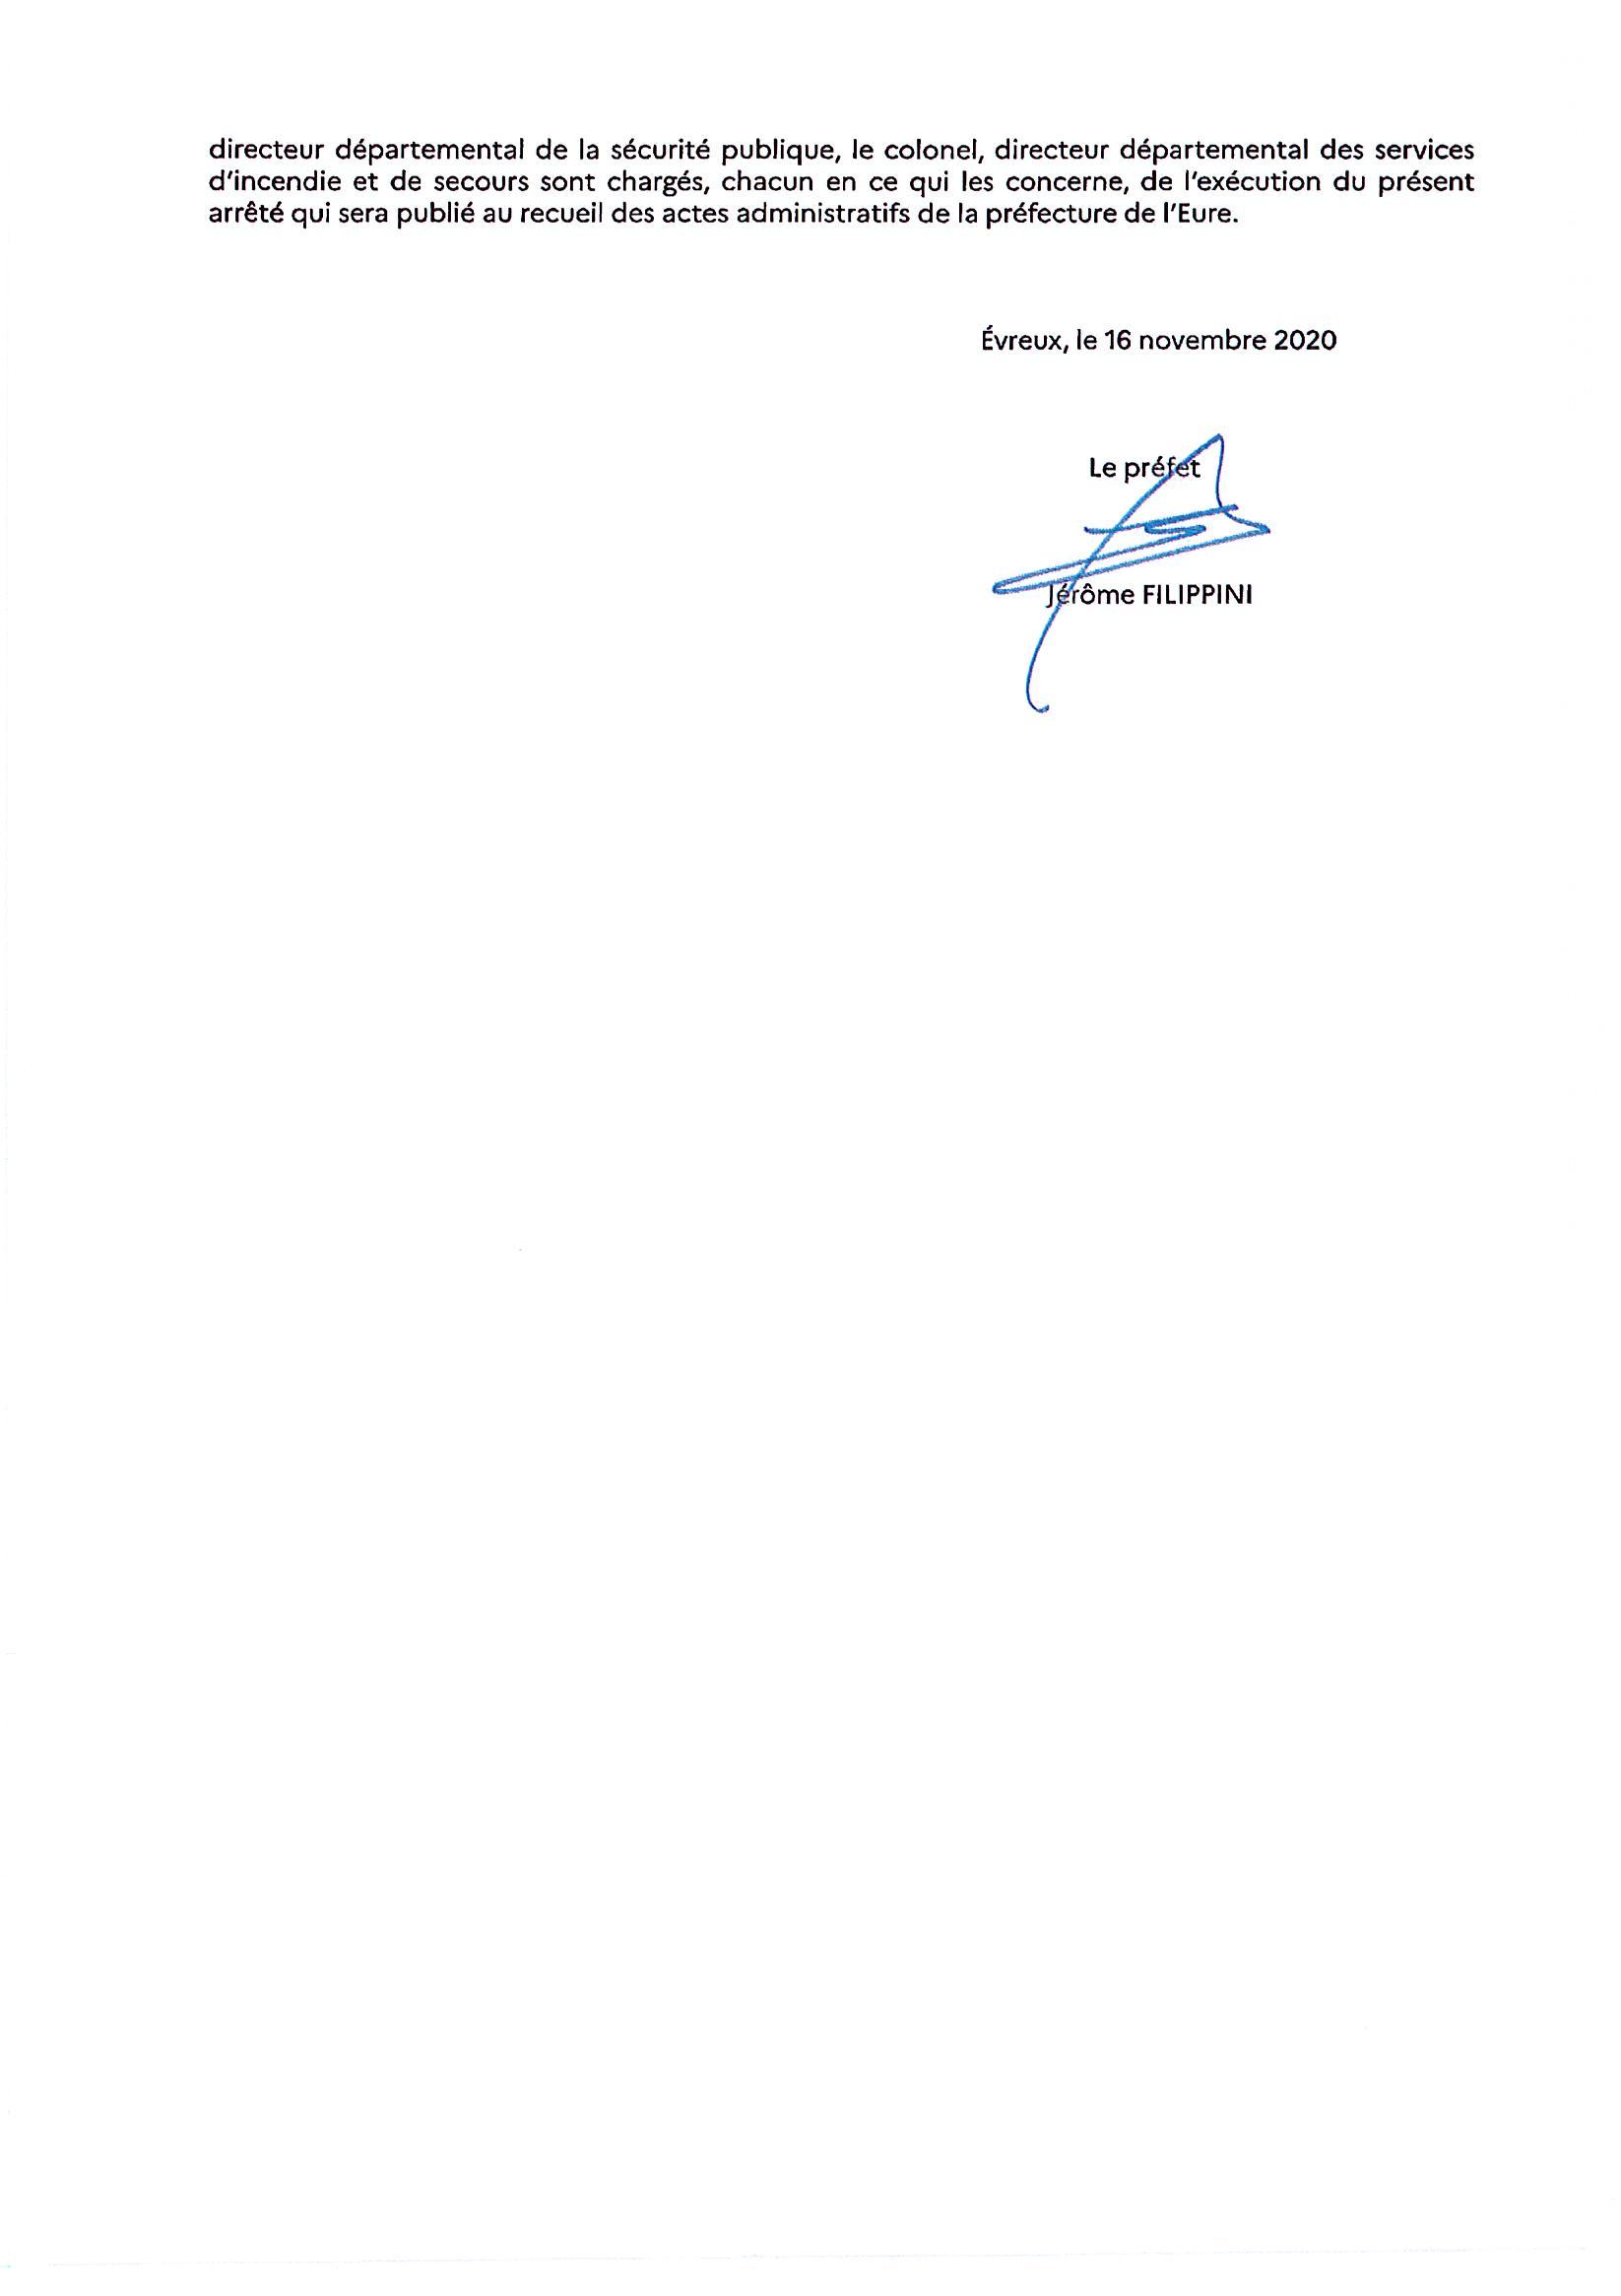 DOC070621-0005-001